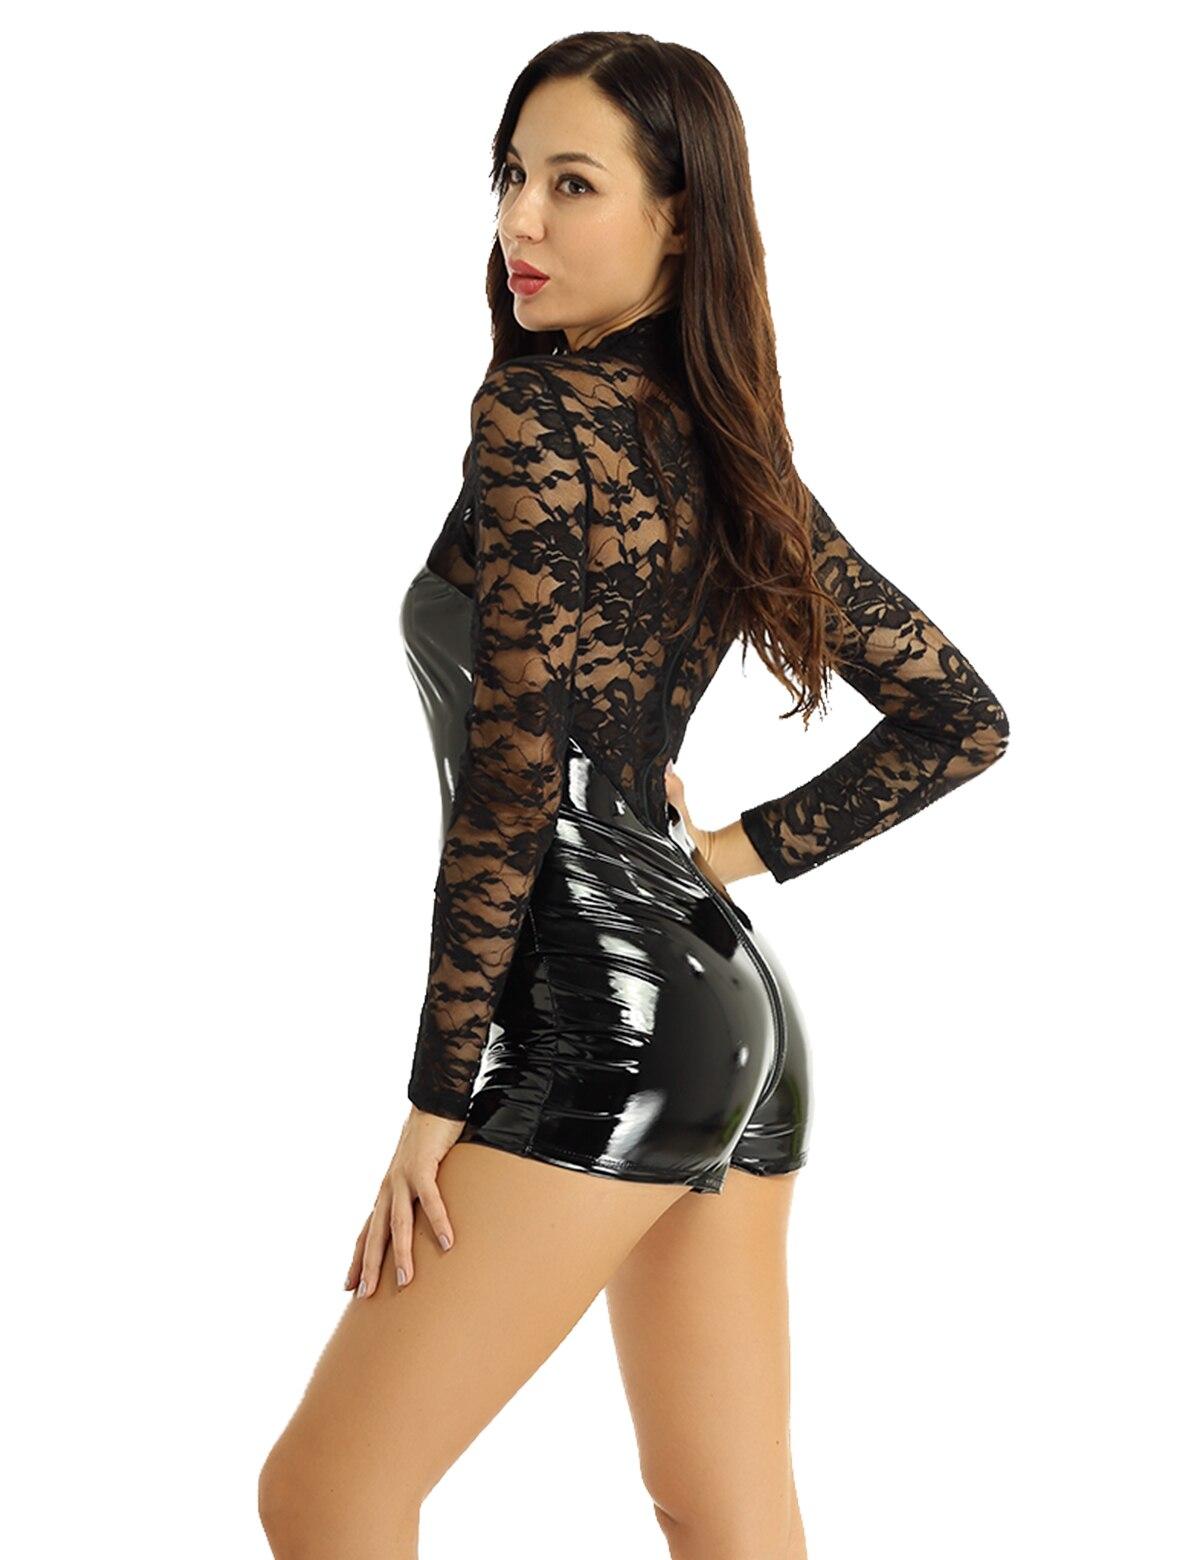 Women/'s Sheer Lace Slim Wet Look Jumpsuit V-Neck See Through Bodysuit Clubwear